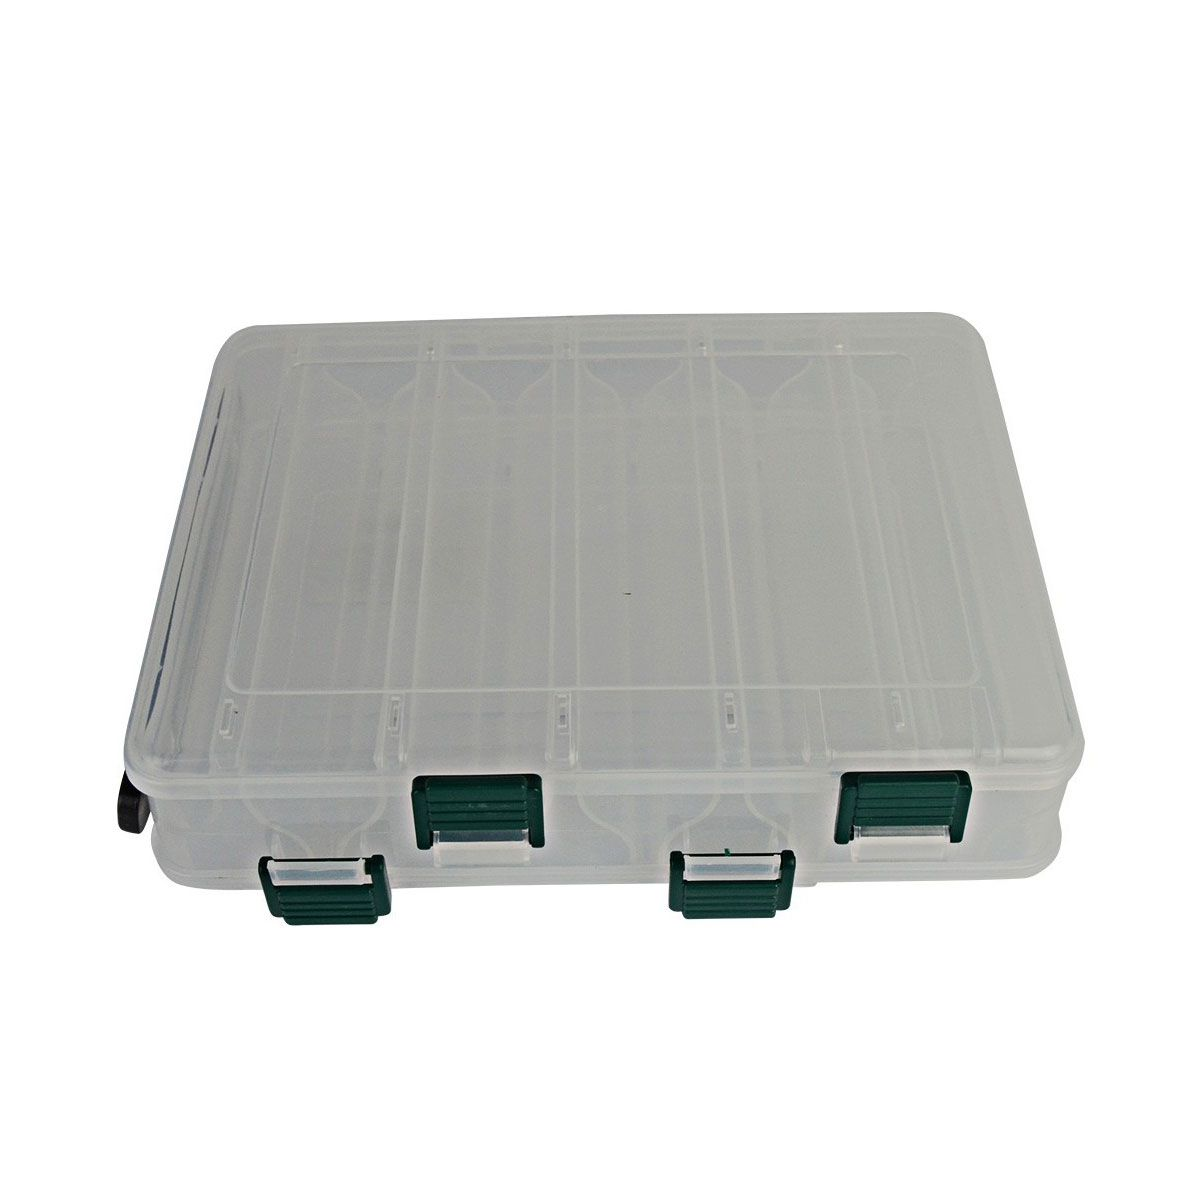 Estojo para Isca Bait Box - HS328